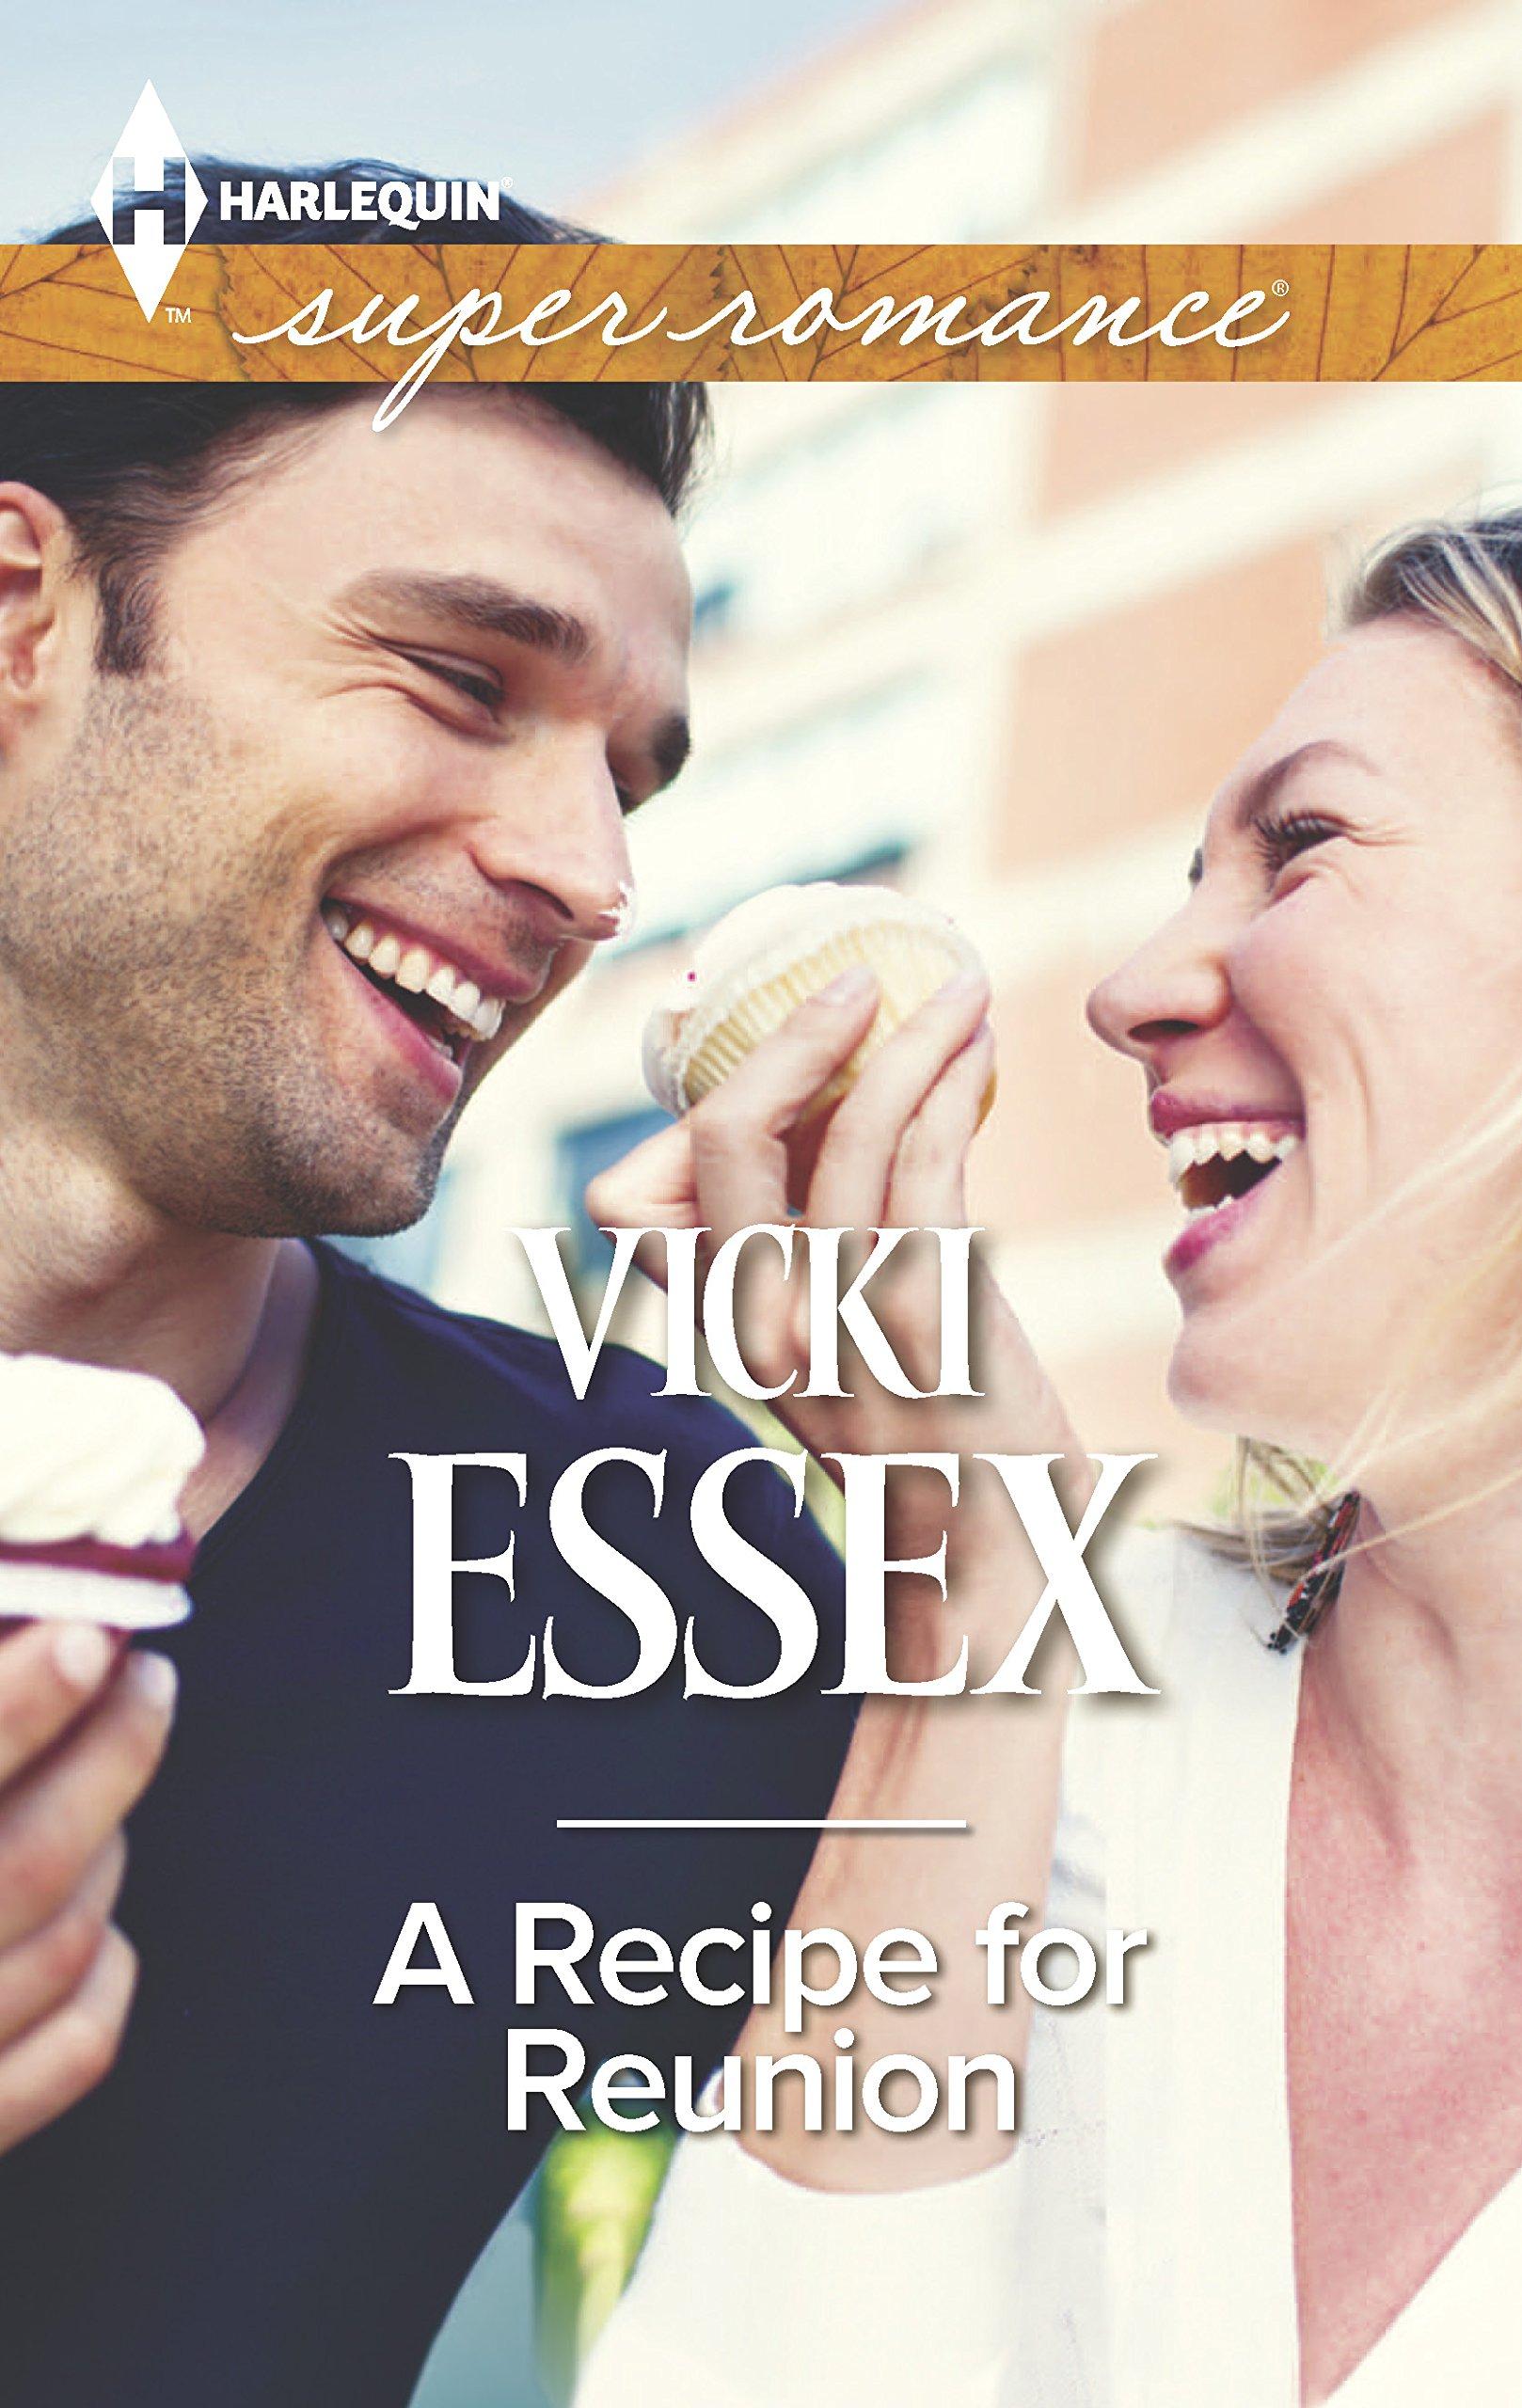 A Recipe for Reunion (Harlequin Super Romance) ebook